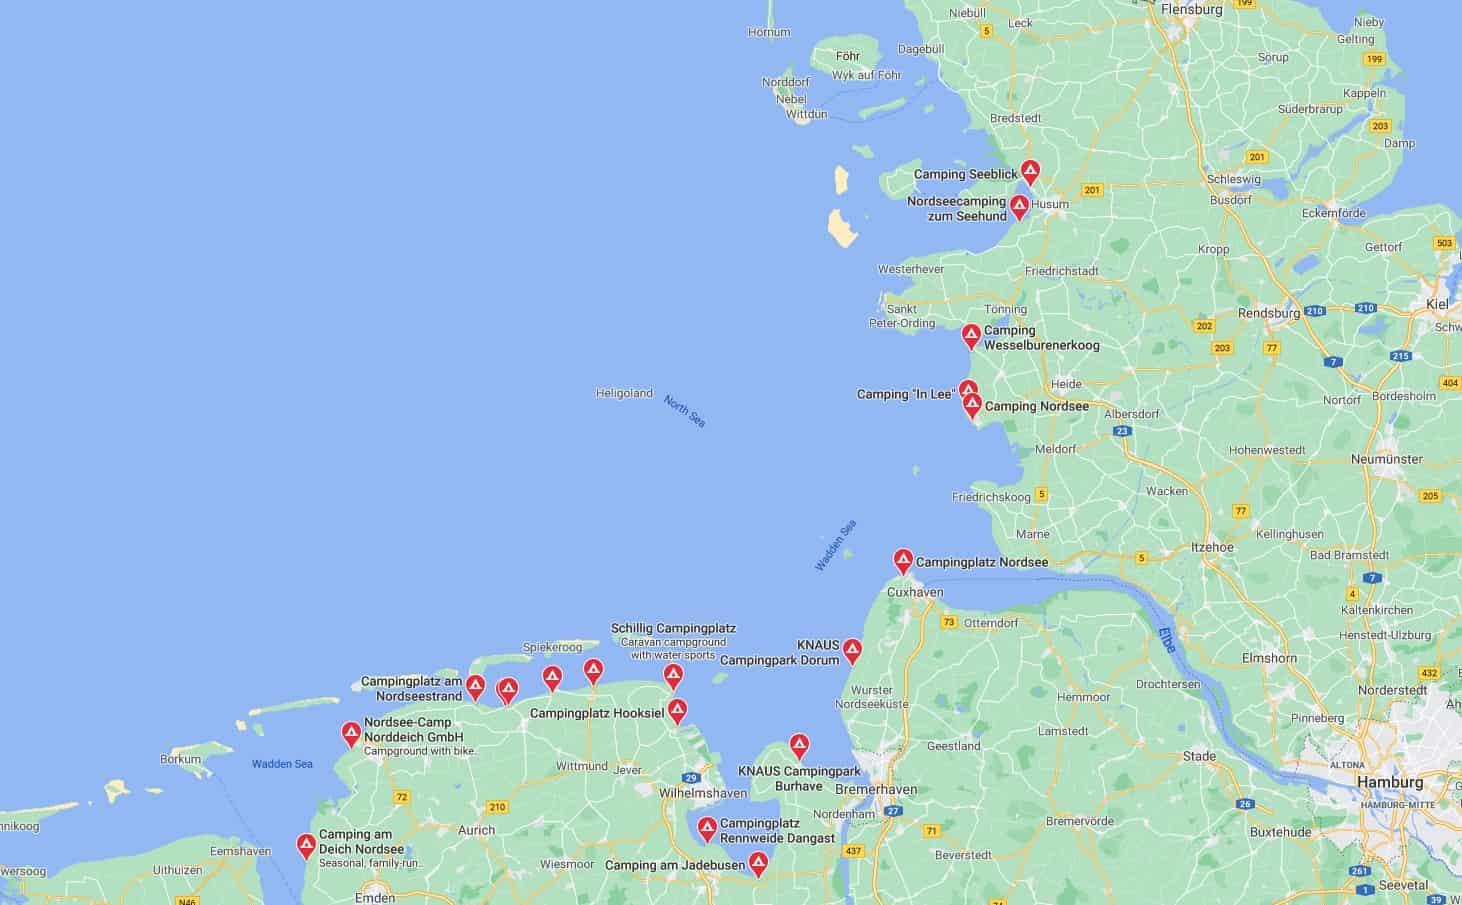 Campingplatz Nordsee Google Maps